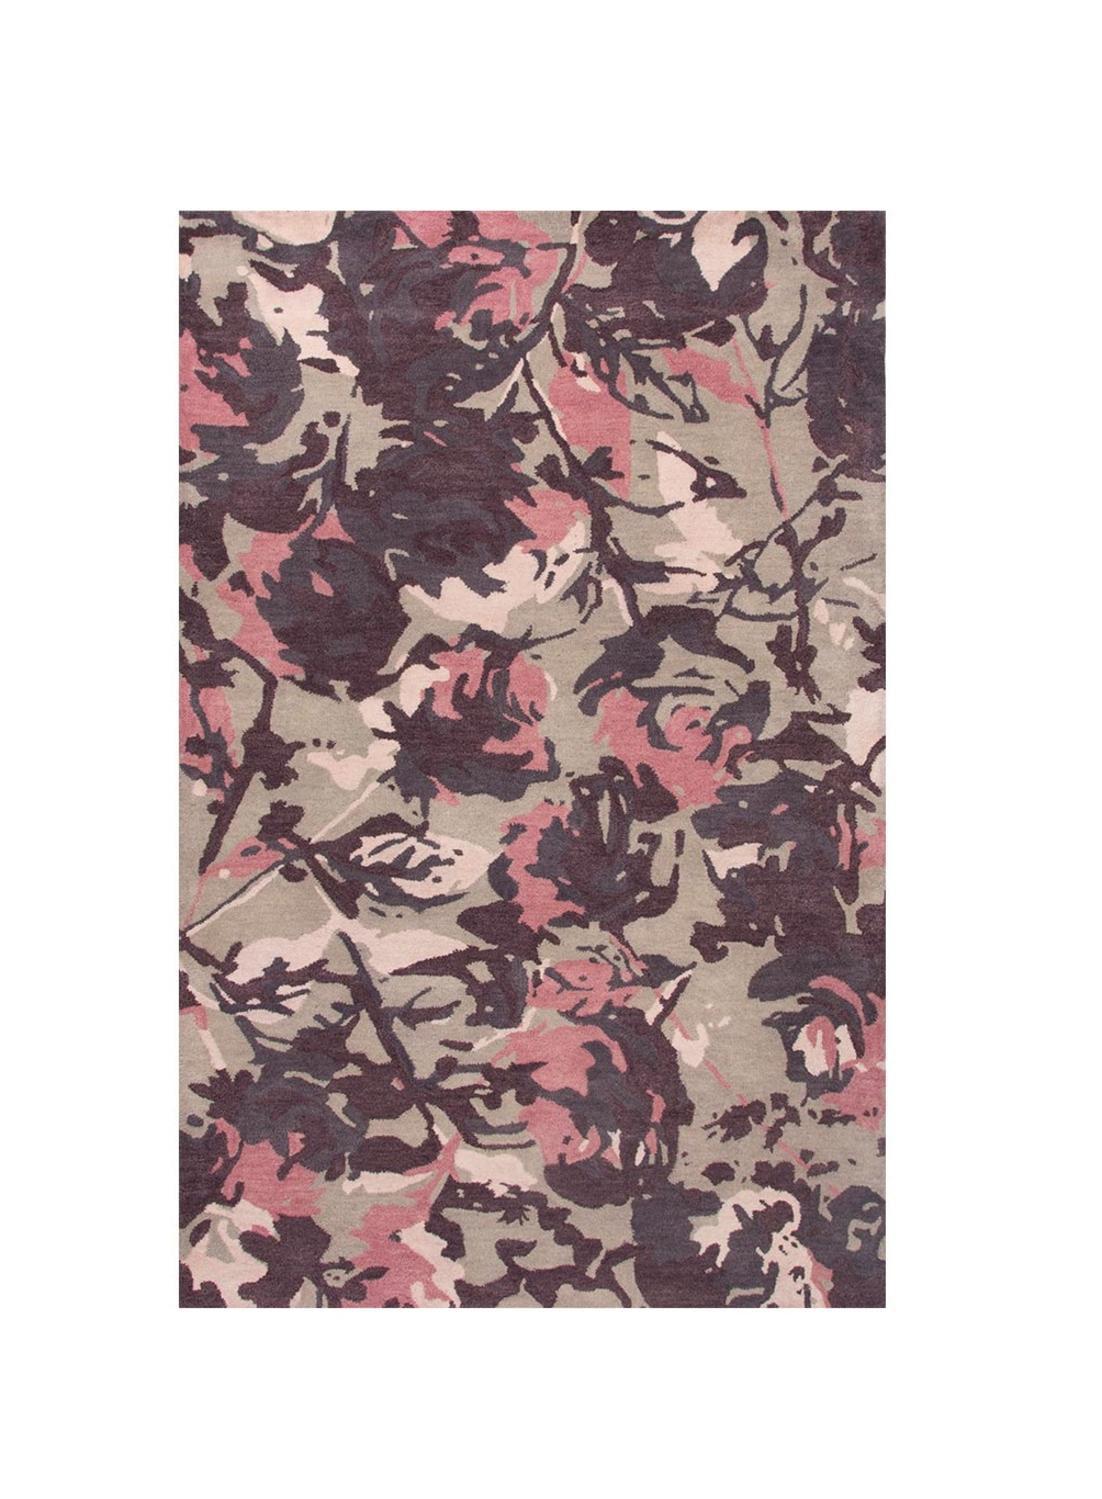 8 X 11 Slate Gray Plum Purple And Midnight Blue Abstract Floral Hand Tufted Wool Area Throw Rug Walmart Com Walmart Com